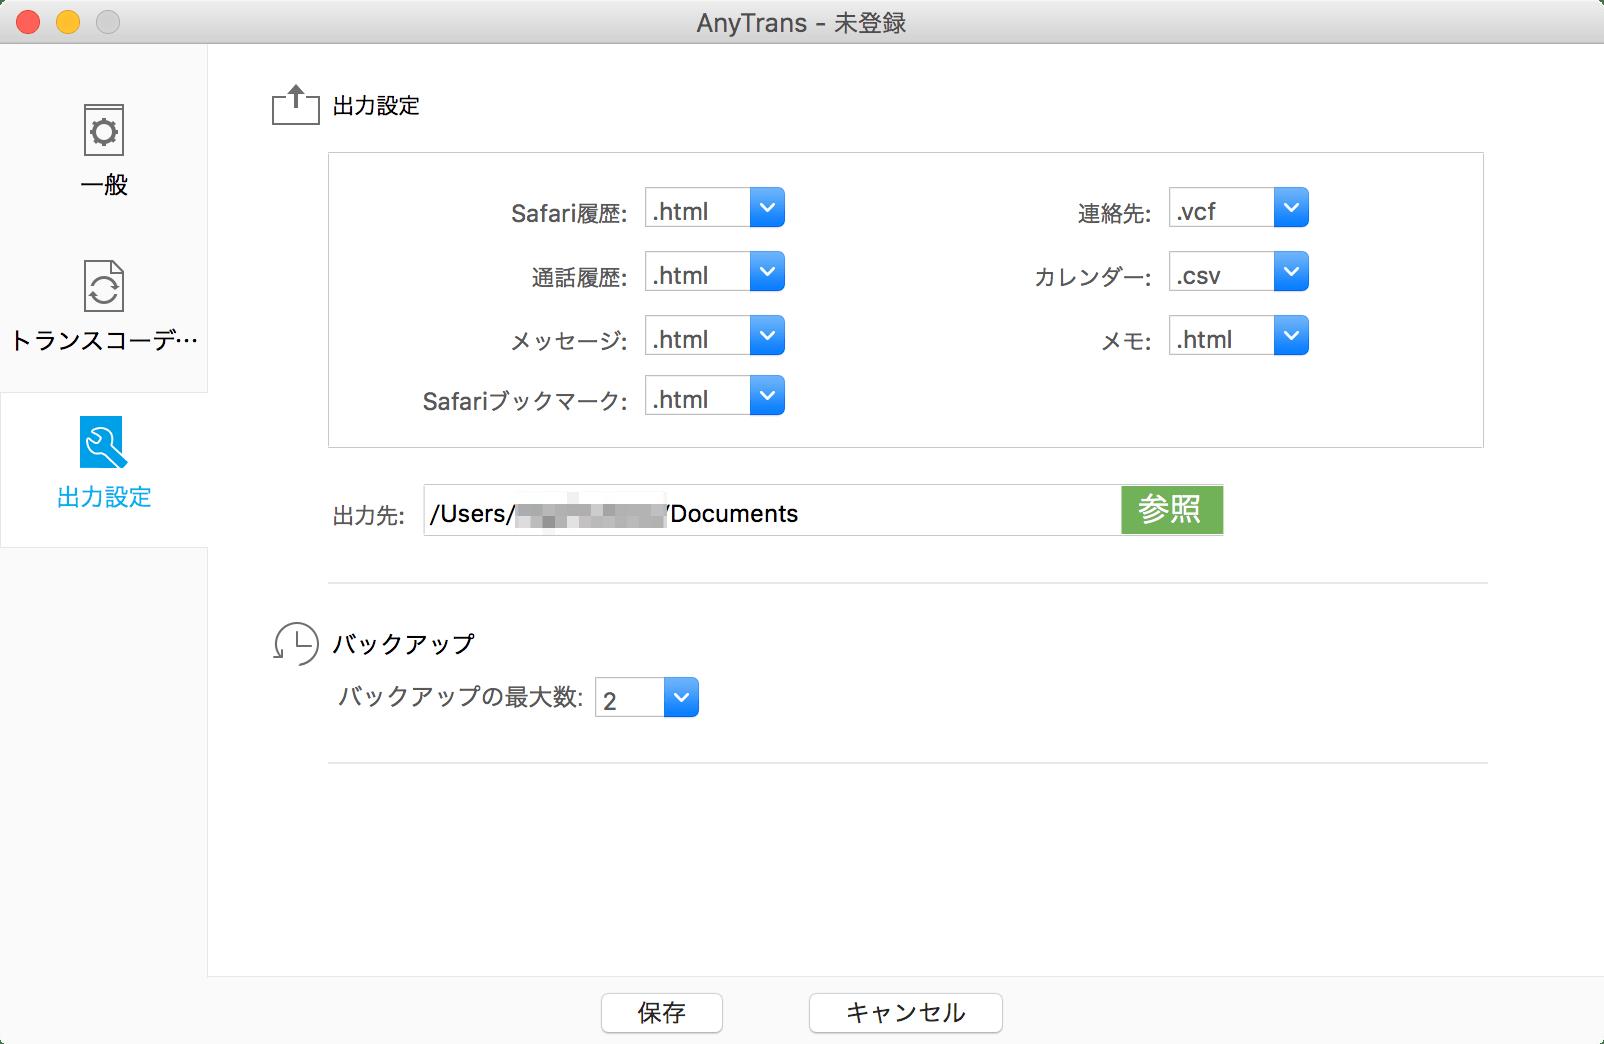 18_20160229_anytrans